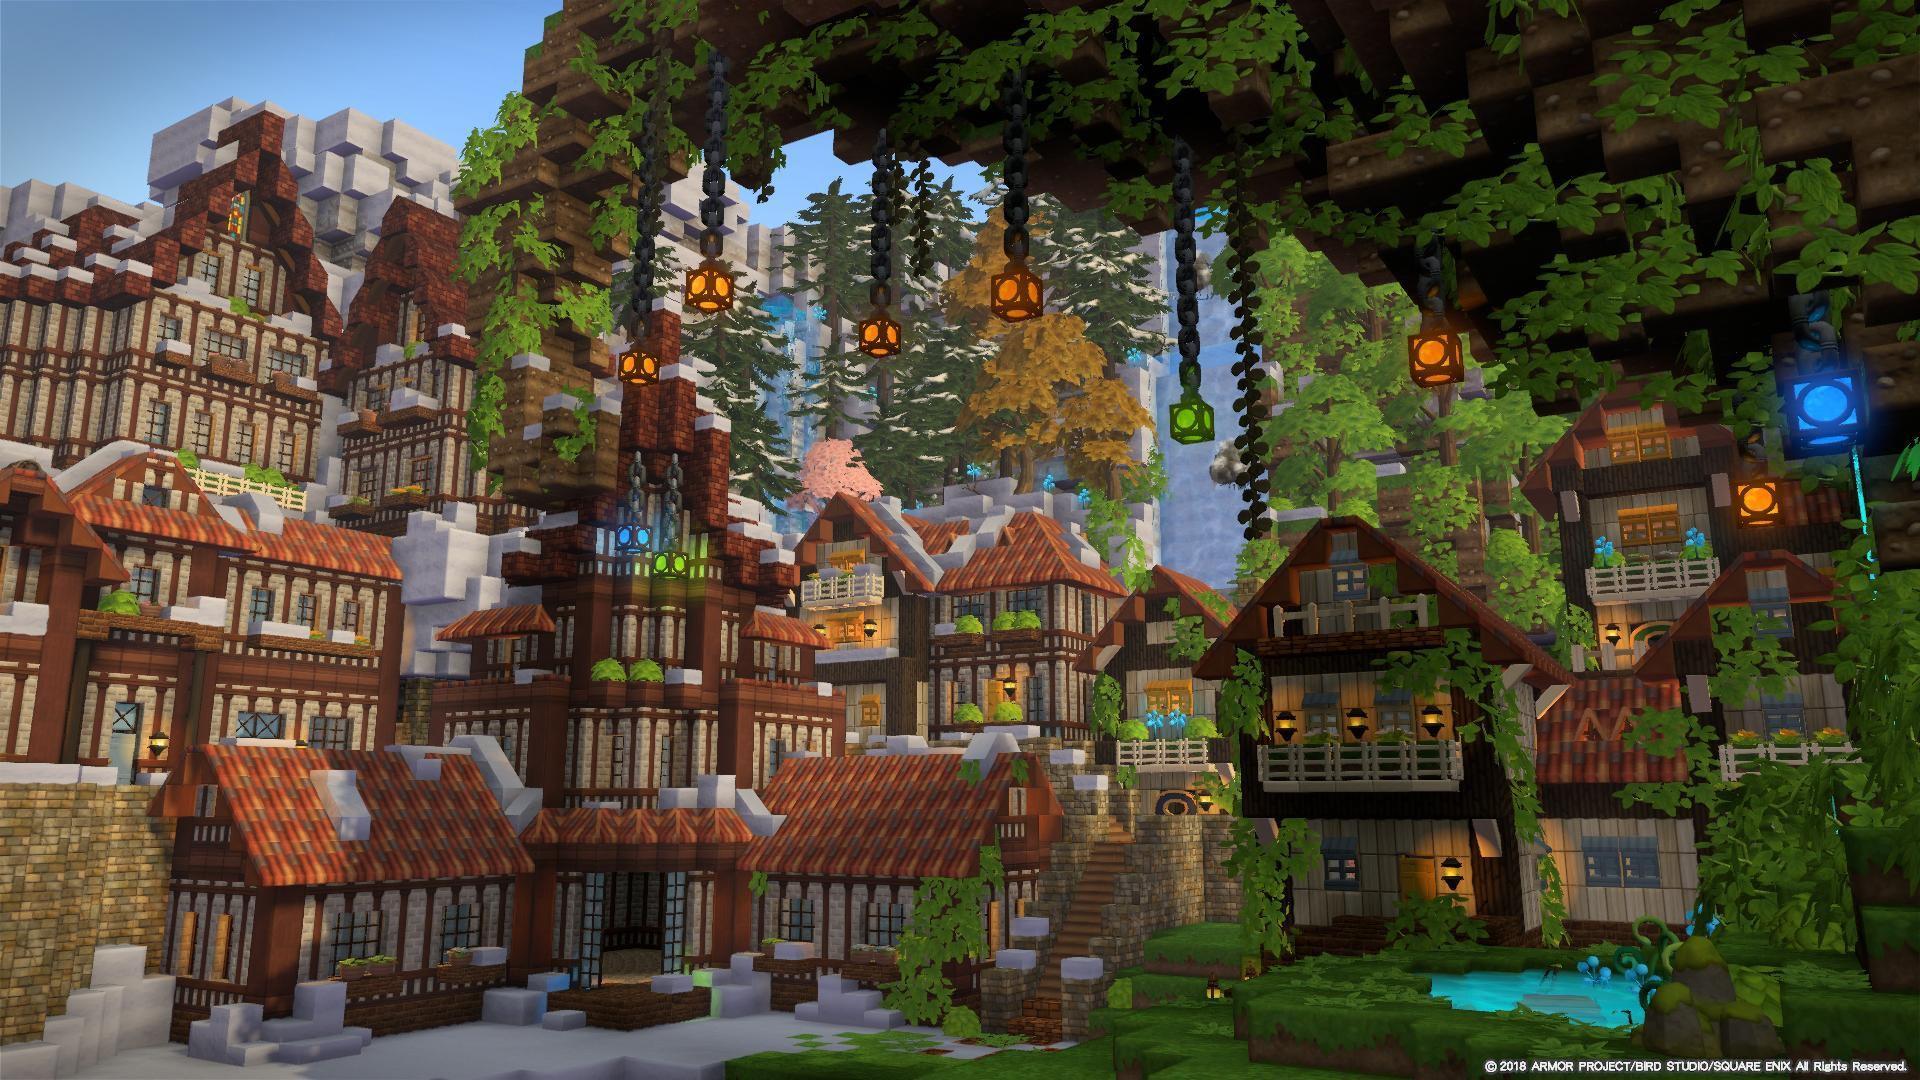 Builders Gallery Dragon Quest Builders 2 Square Enix 2020